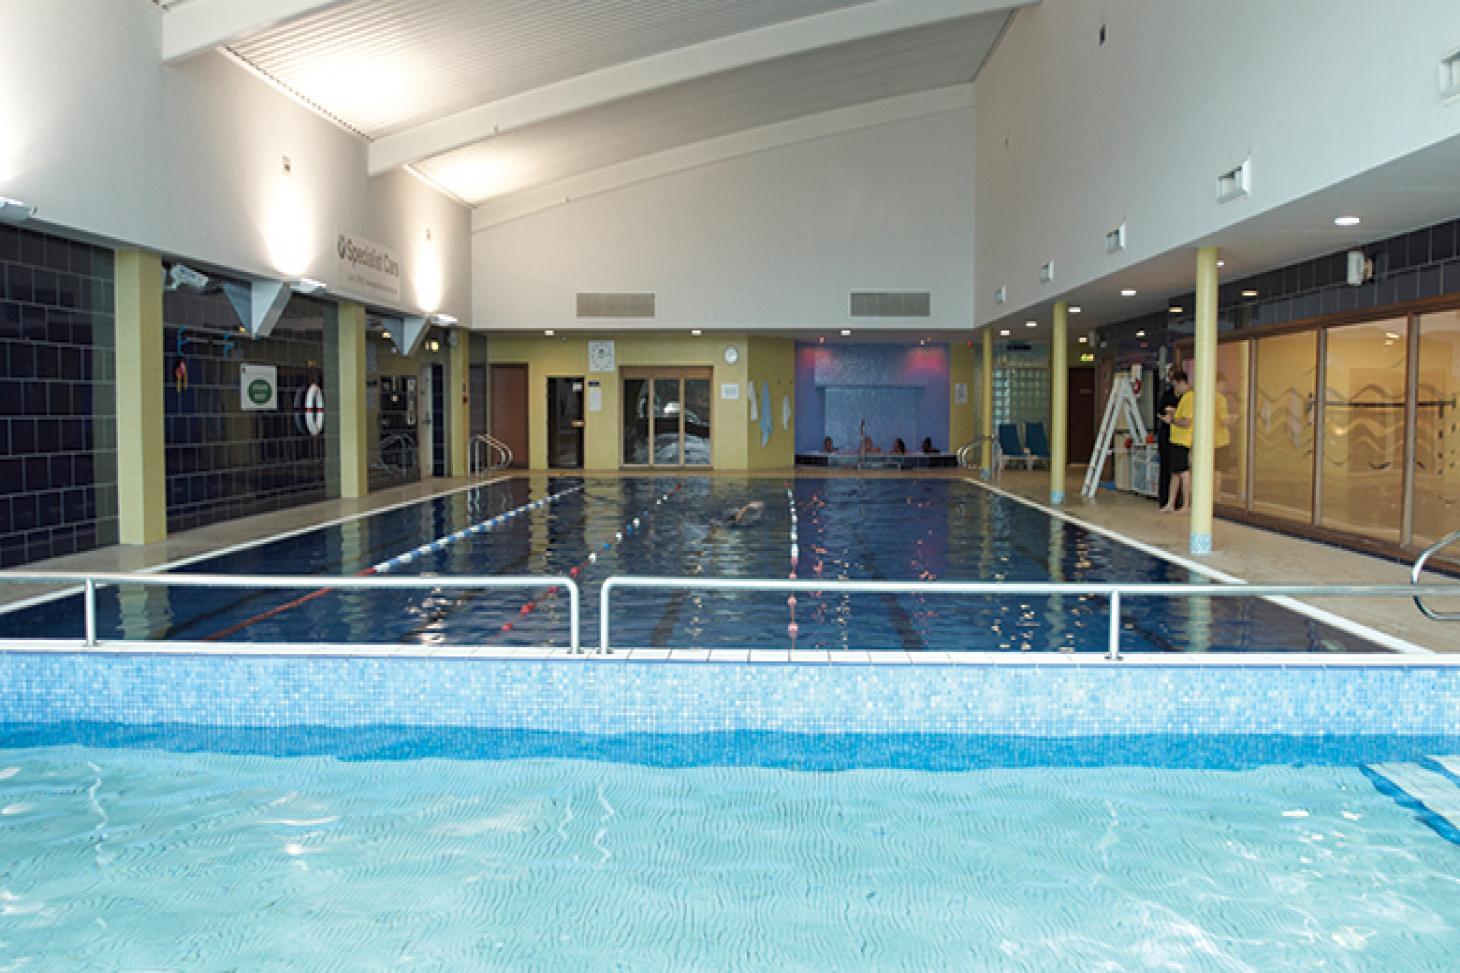 David Lloyd Luton Indoor swimming pool